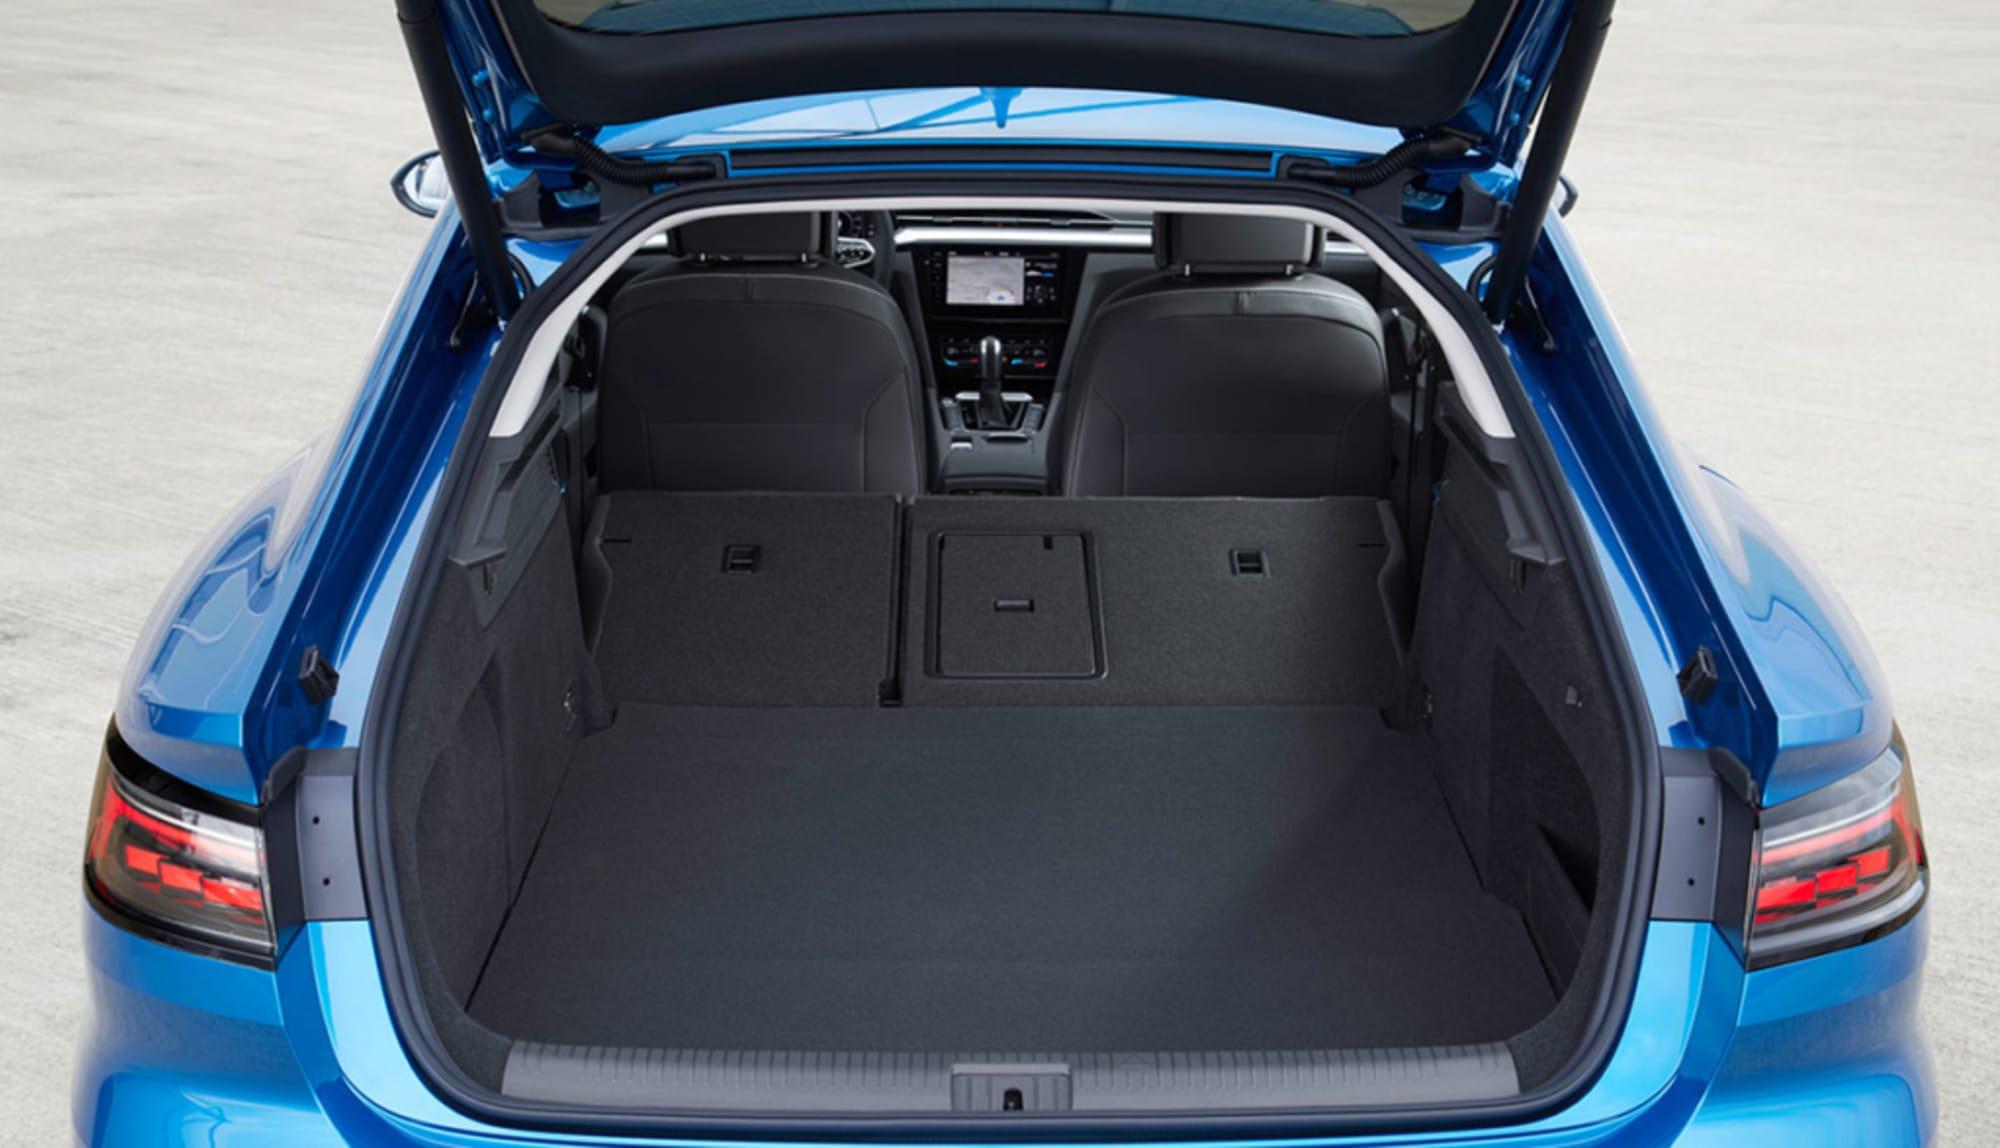 VW-Arteon-eHybrid-2020-5-1024x588